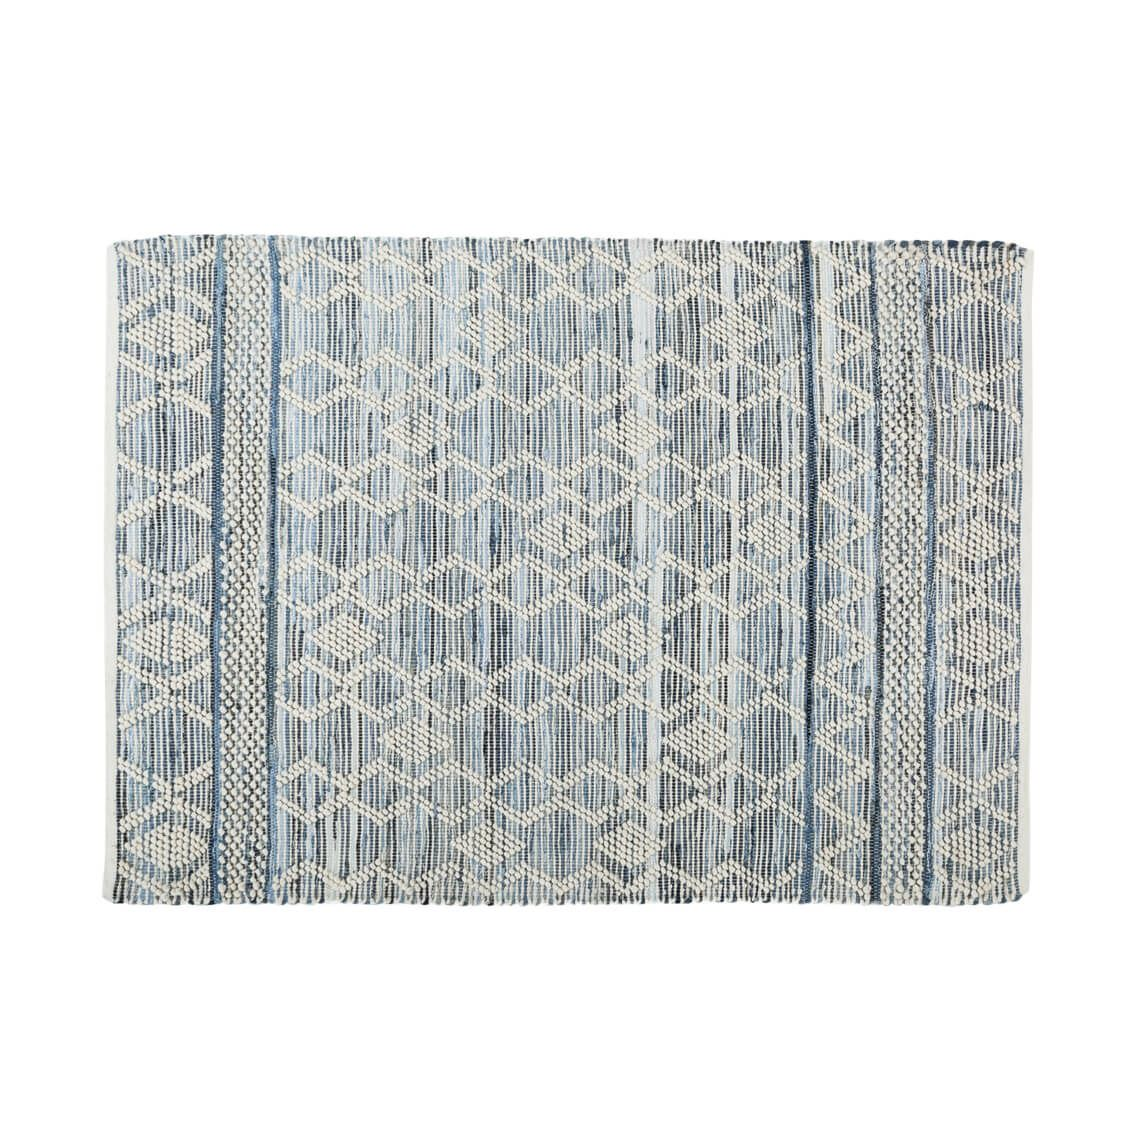 Athire Floor Rug Size W 160cm x D 230cm x H 2cm in Blue Freedom